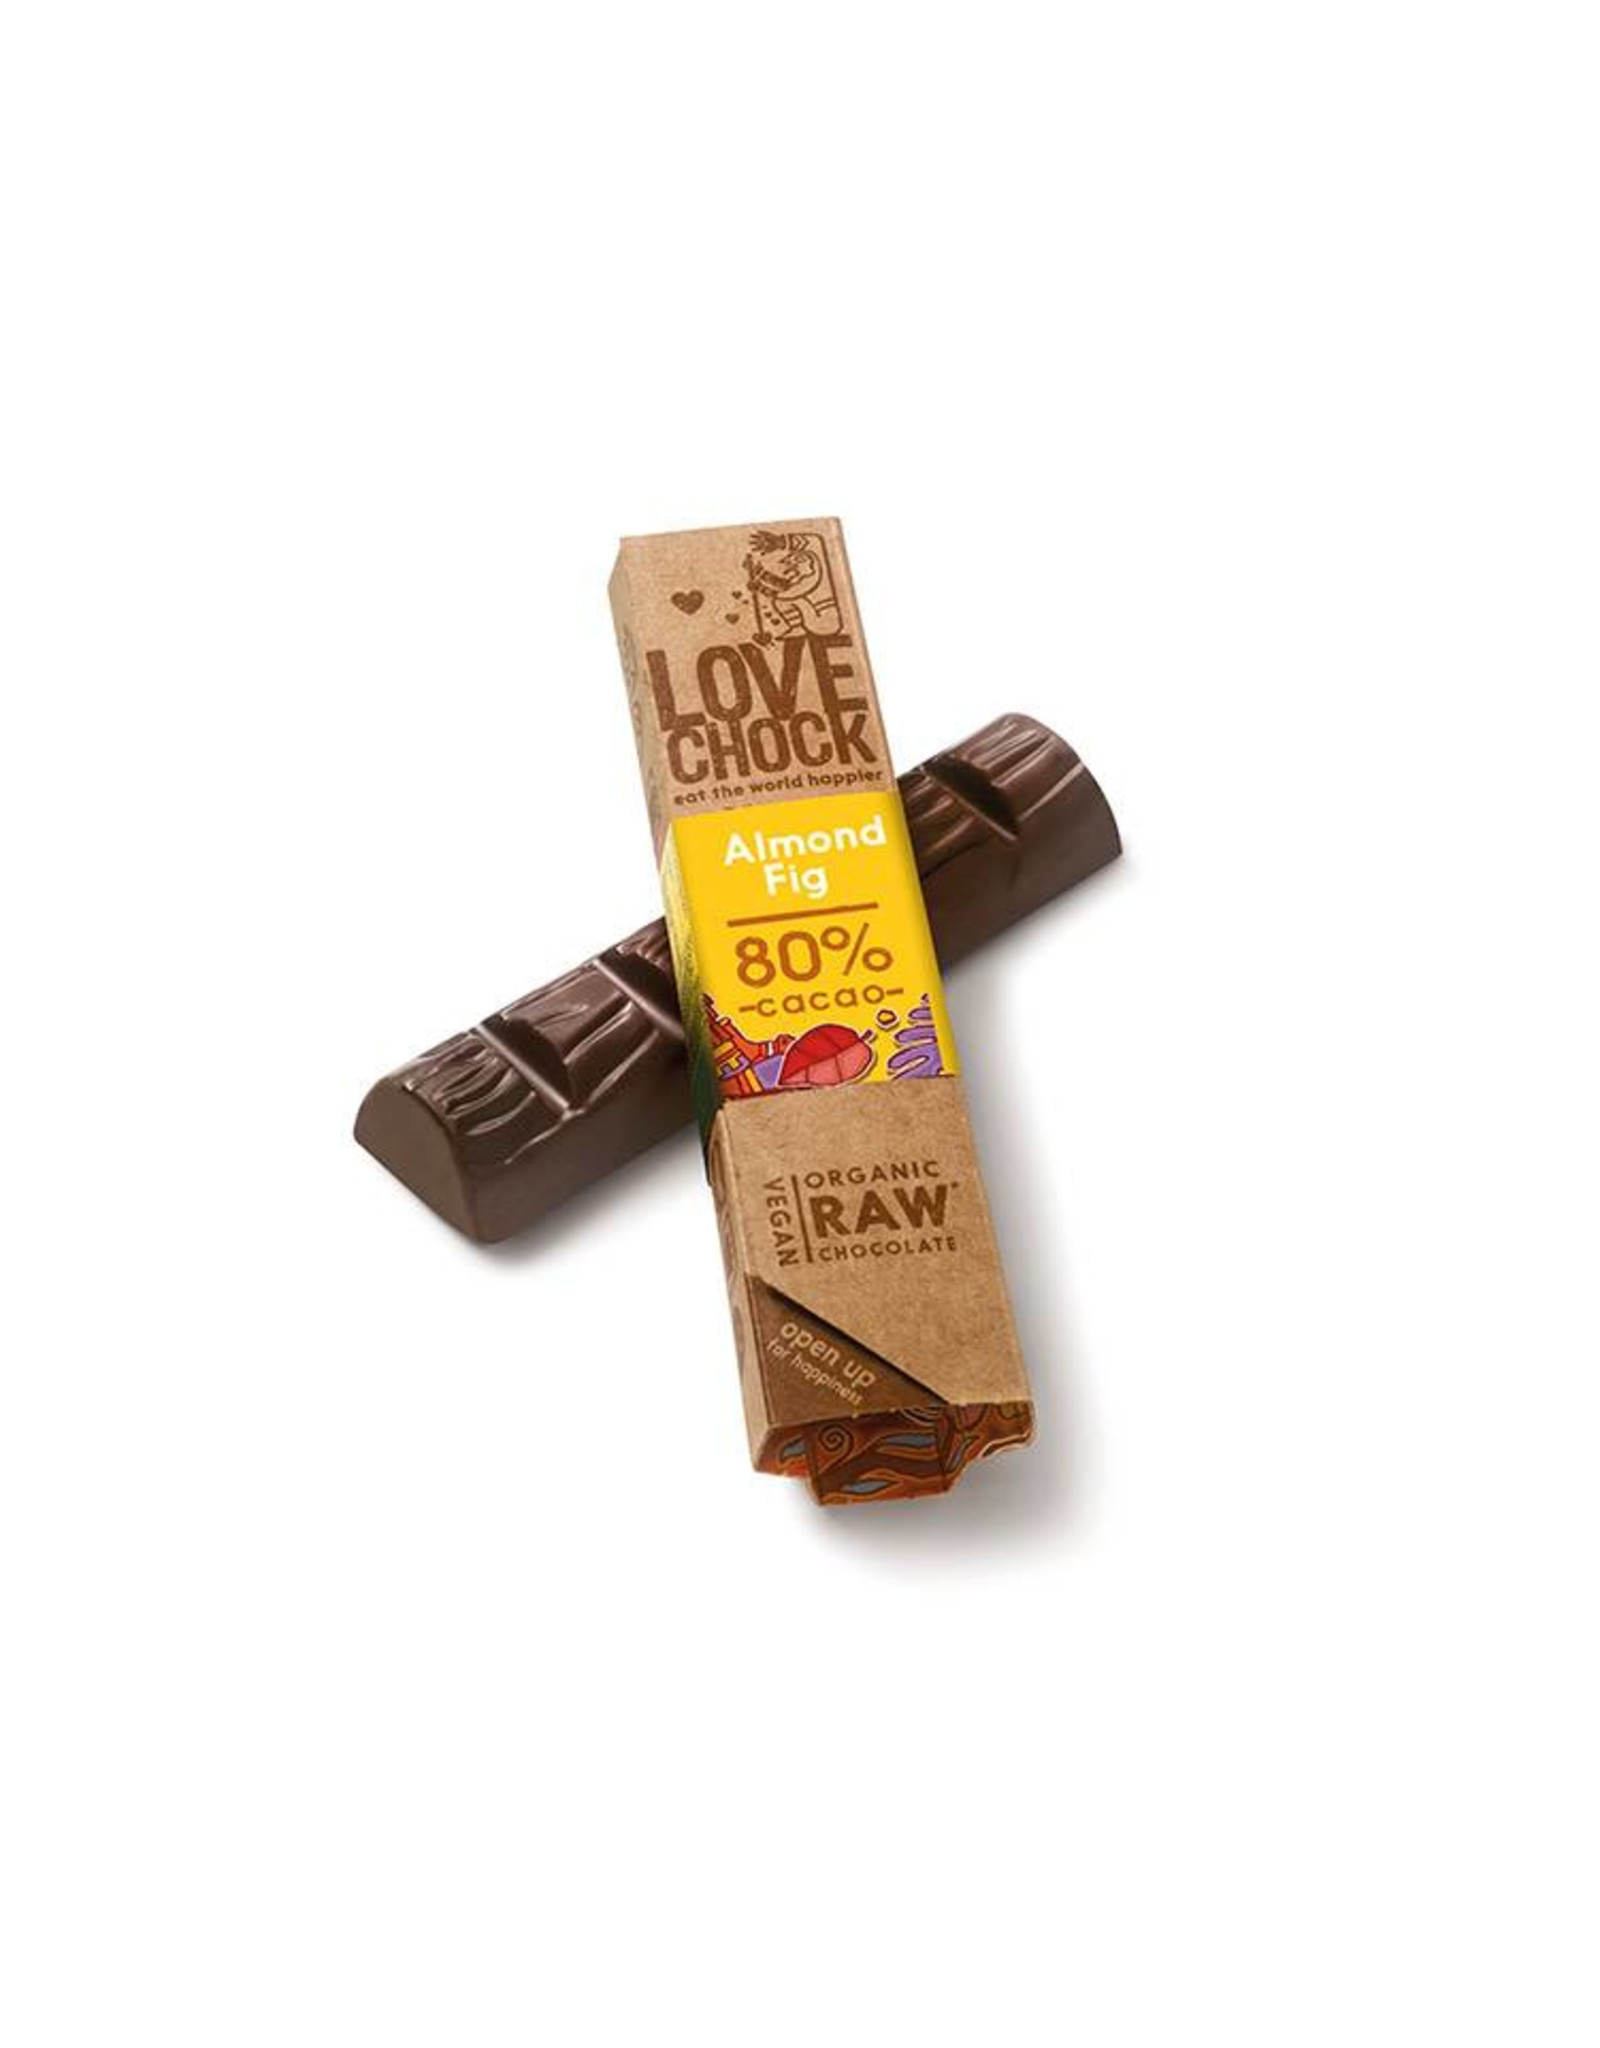 Lovechock Love Chock - Almond Fig Organic Raw Chocolate